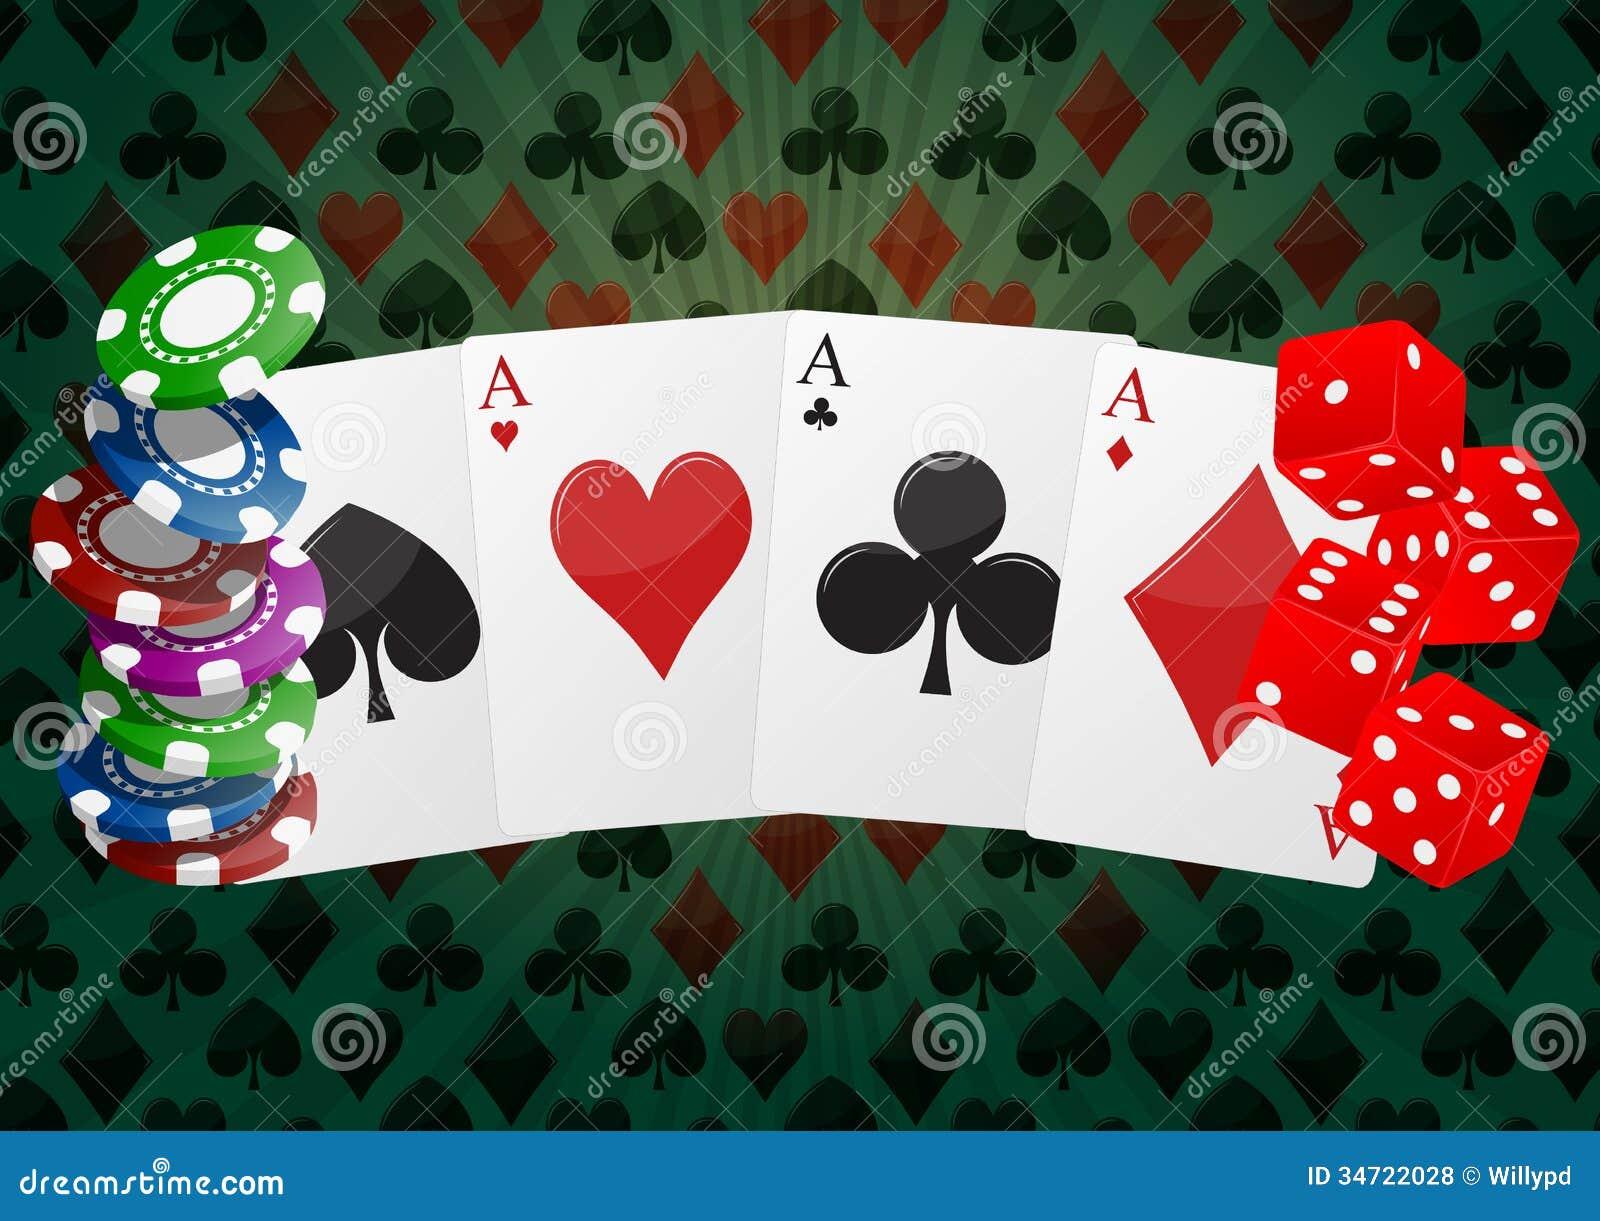 4 pics 1 word casino gambling cards